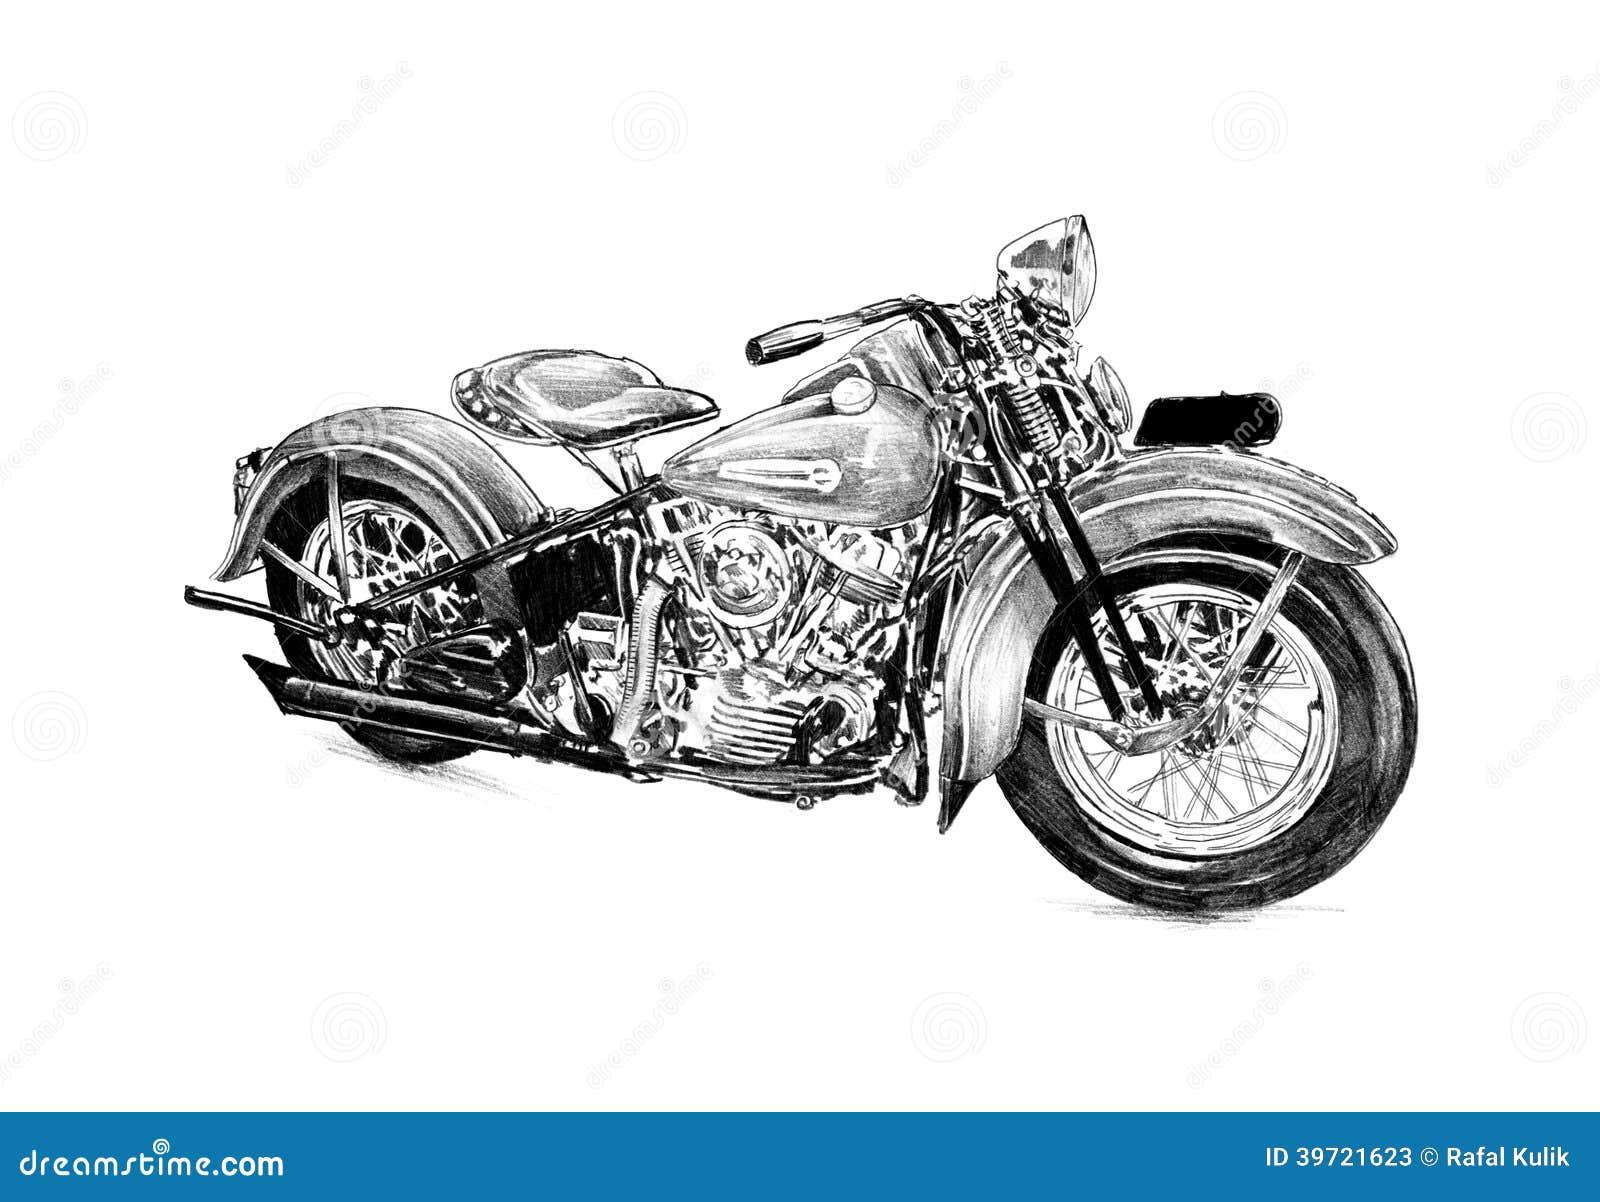 Motor cycle illustration drawing isolated art stock illustration